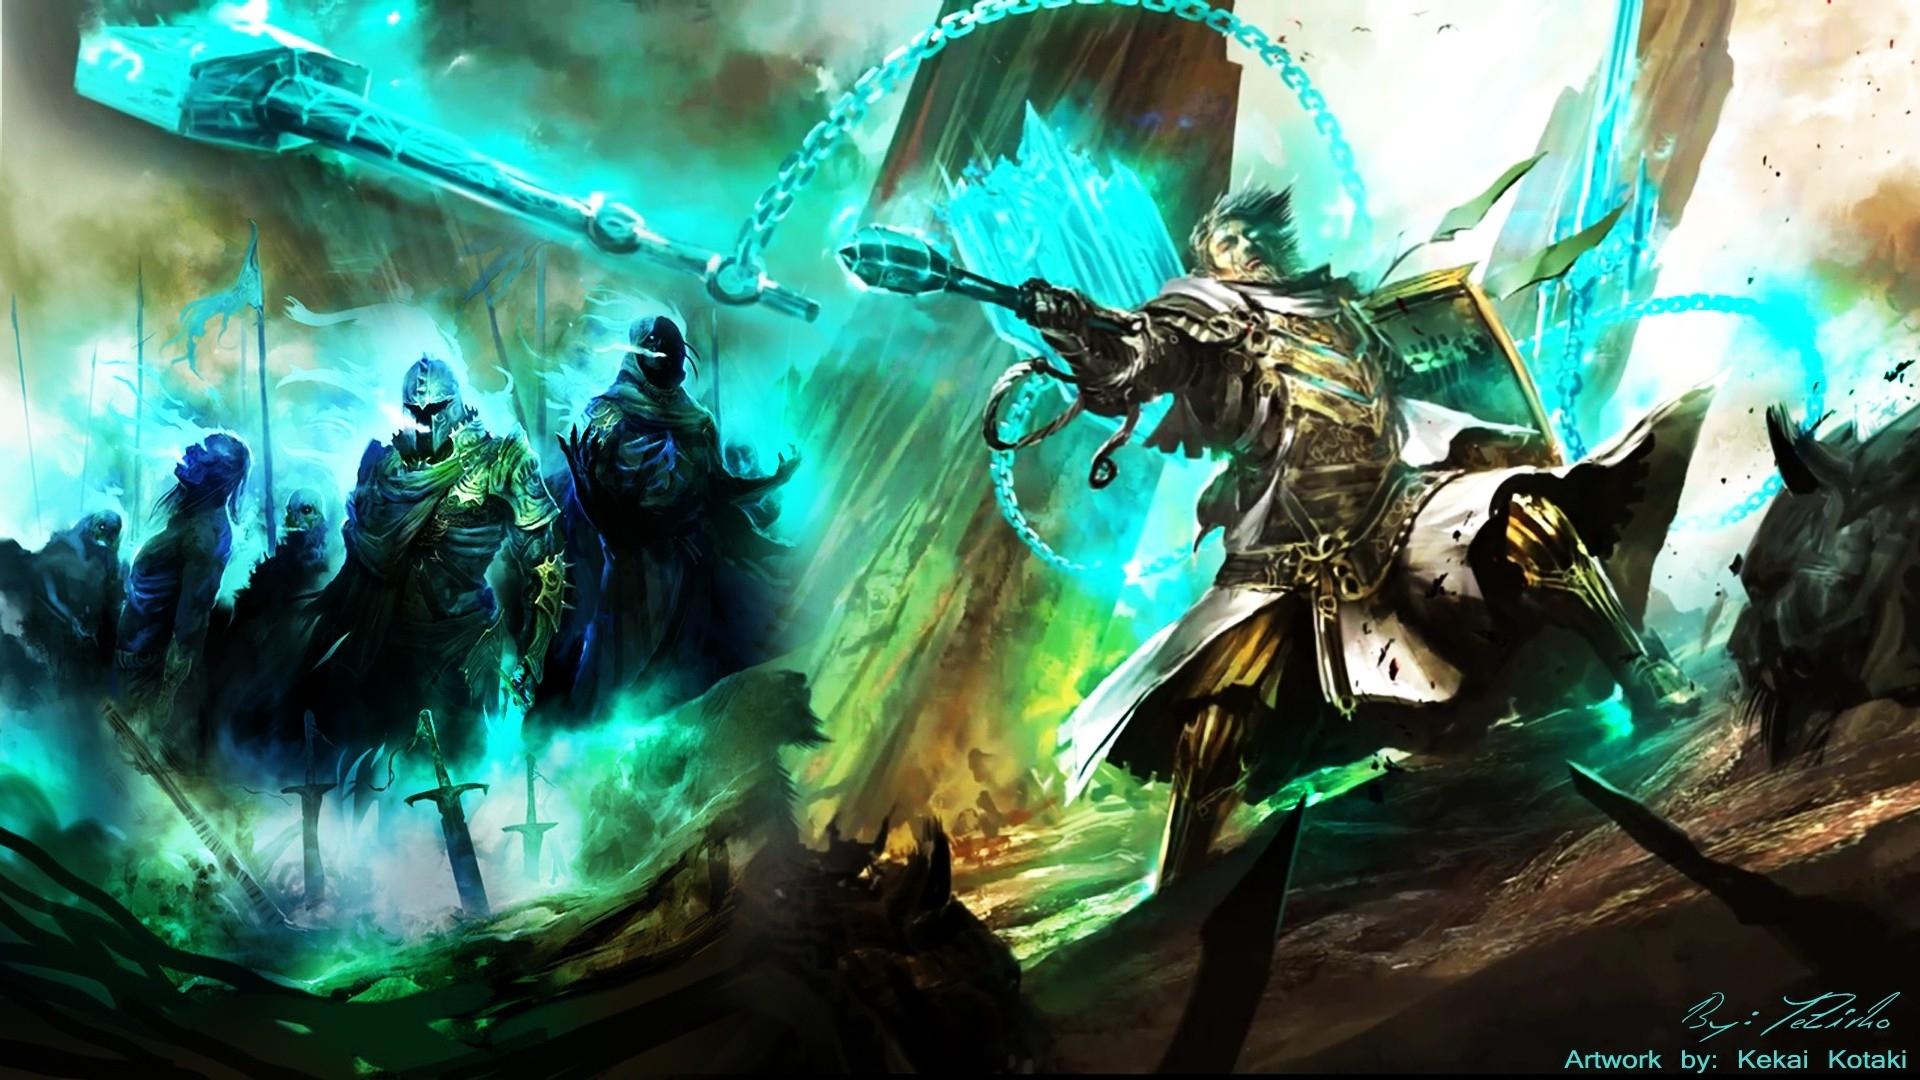 Free Download Guild Wars 2 Hd Wallpaper Background Image 1920x1080